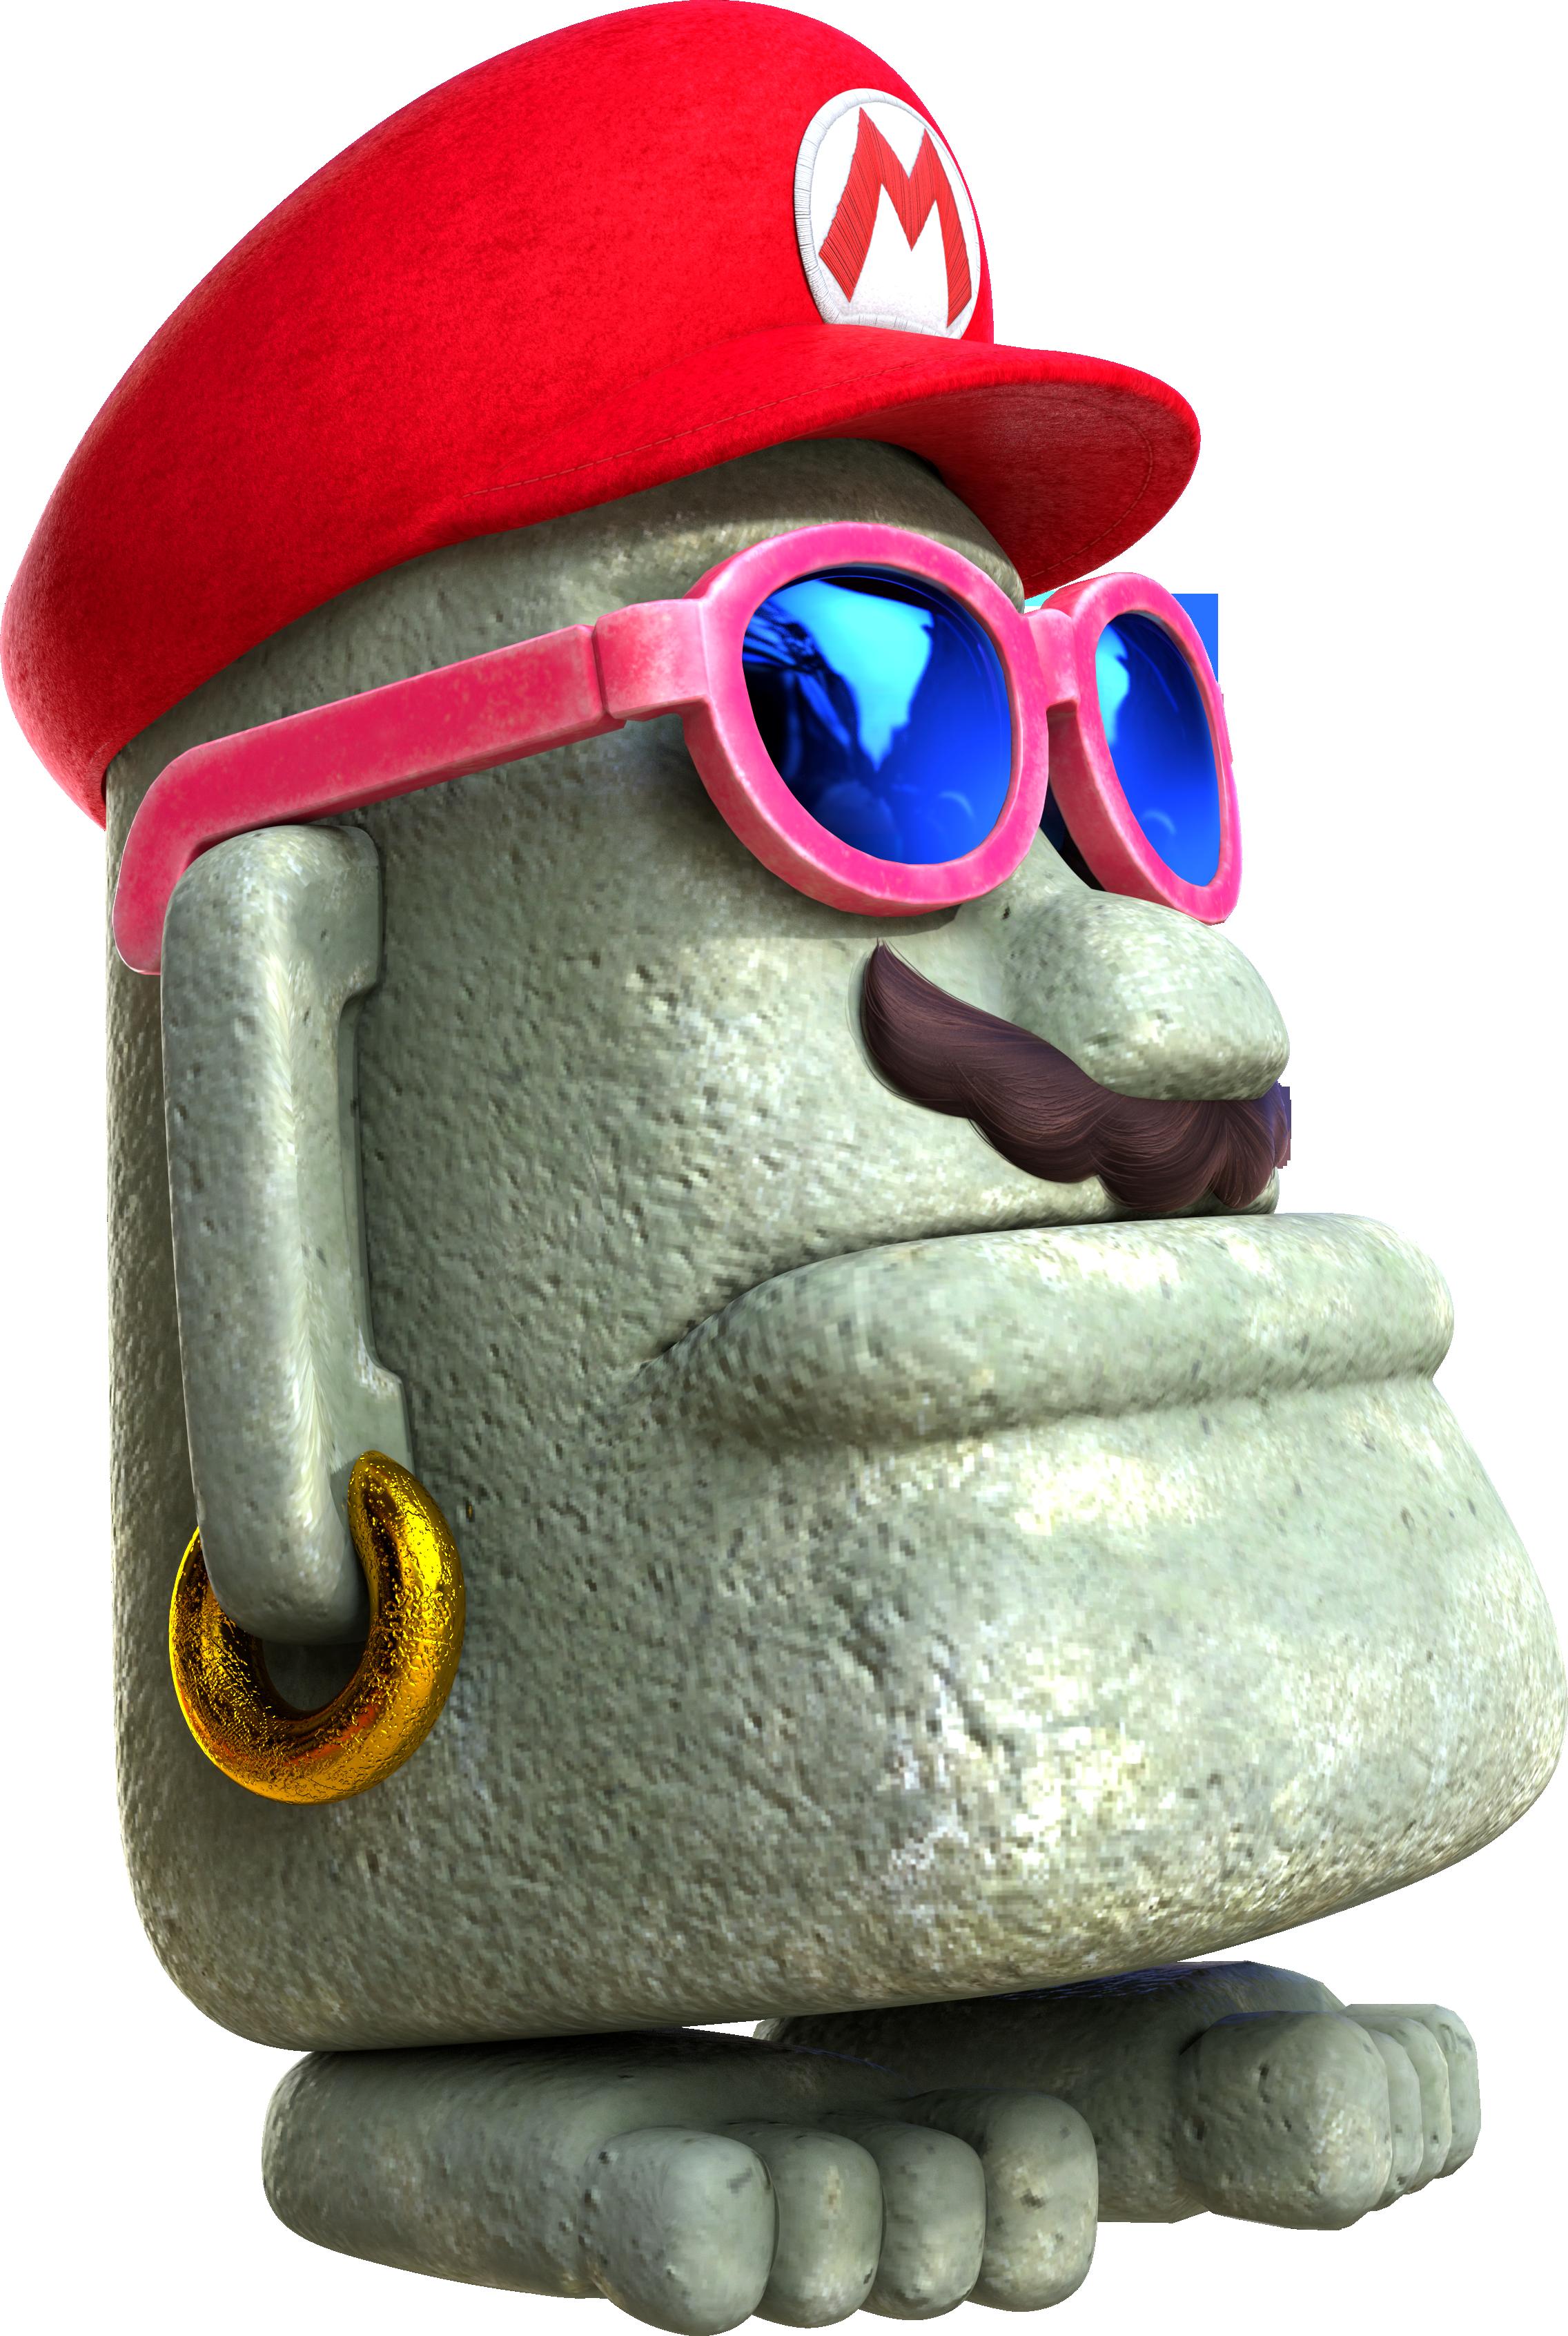 Moe Eye Nintendo Fandom